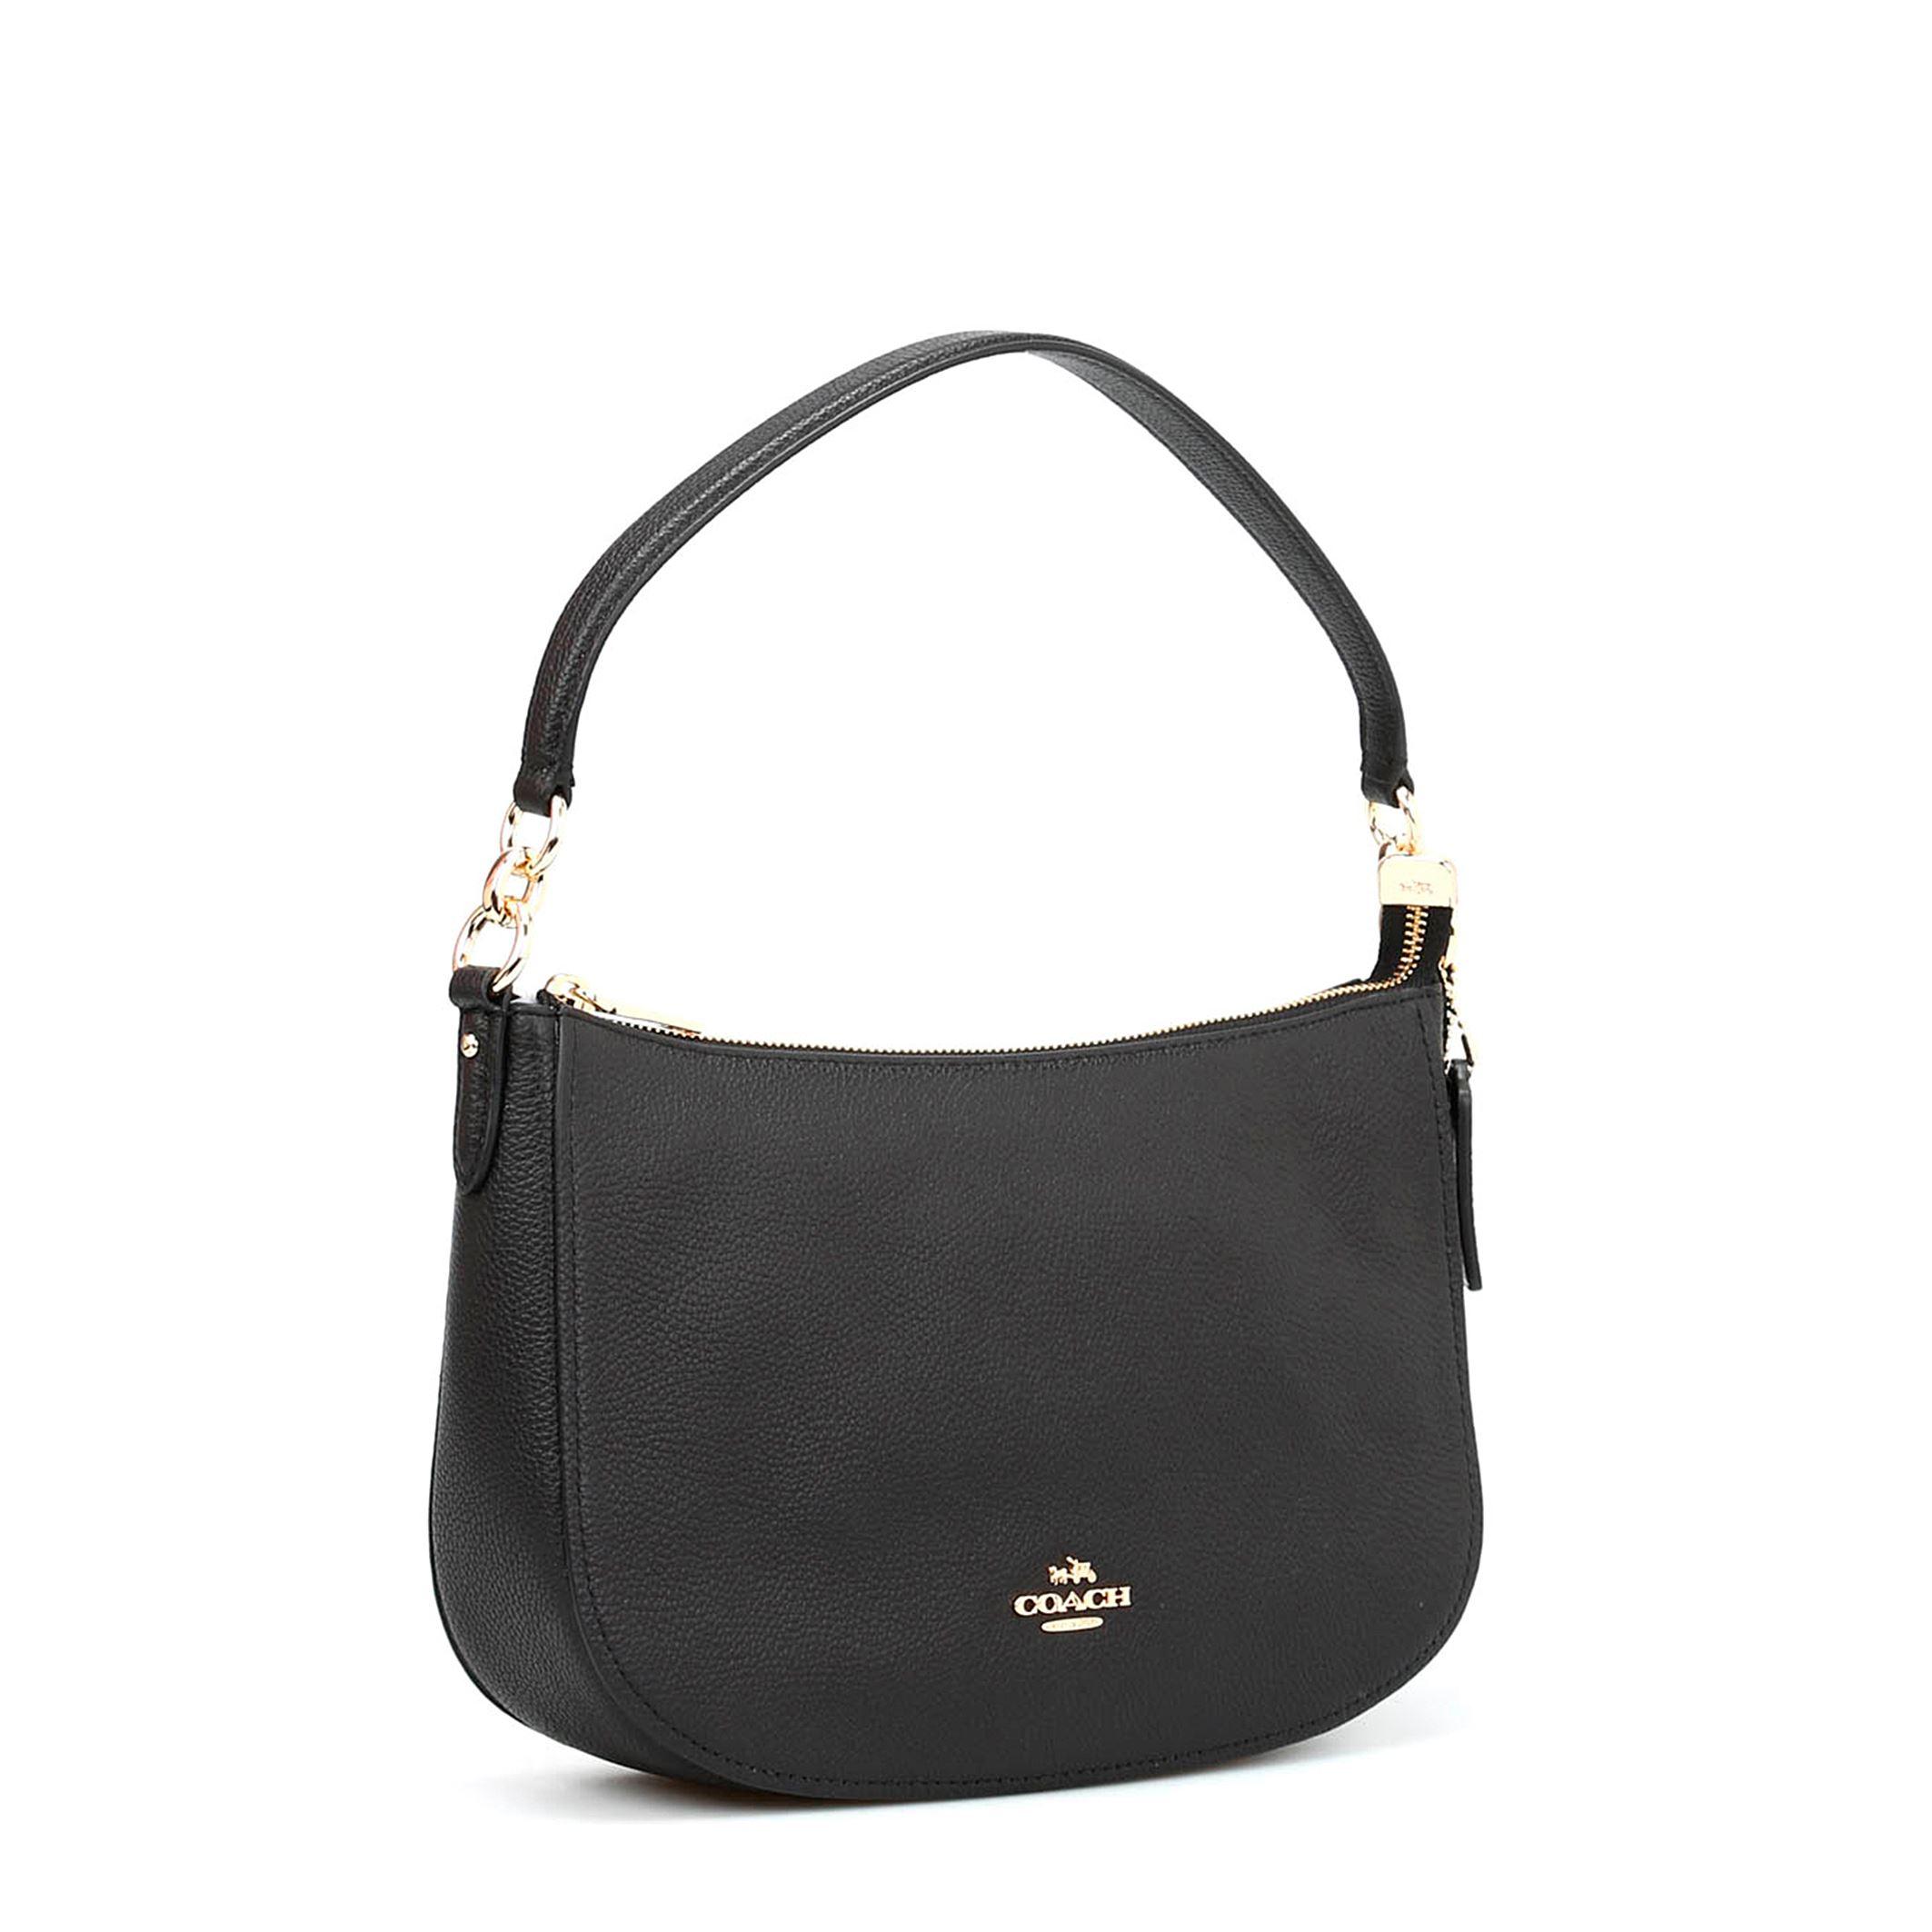 Details about Coach Women s Black Leather Hobo Shoulder Bag Removable Strap  Pockets 793bea306b